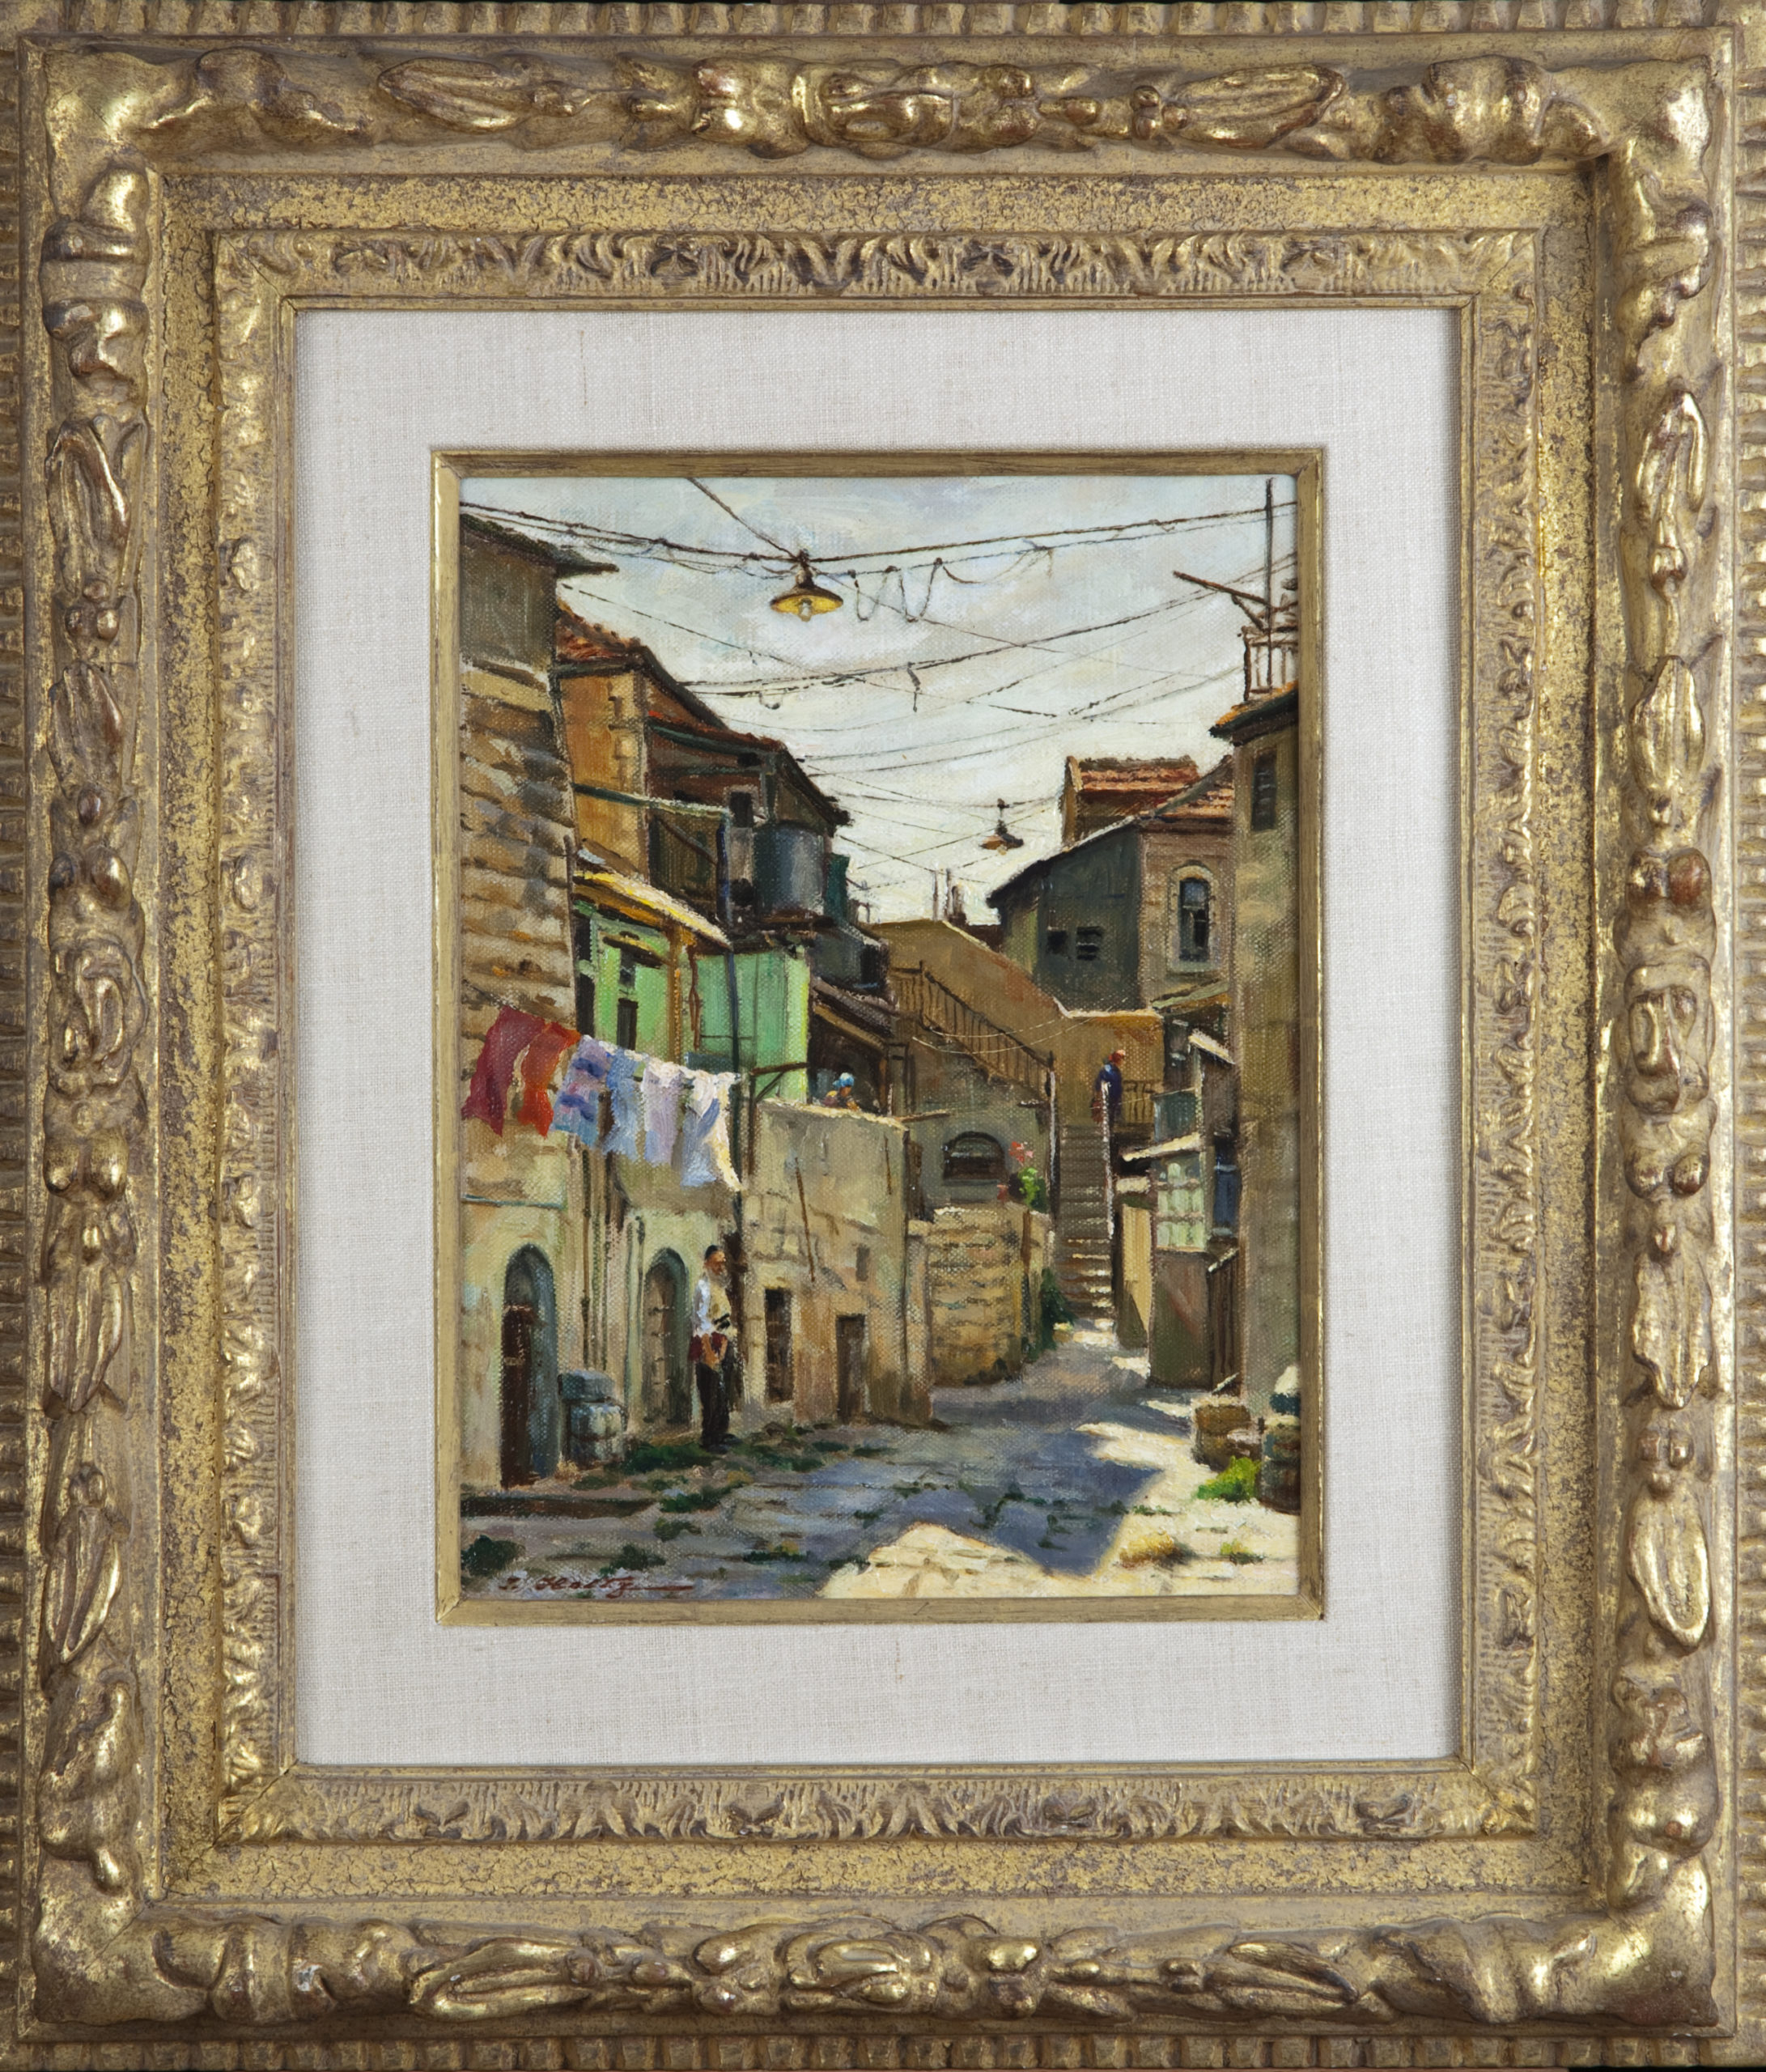 074 Courtyard Jerusalem 1977 - Oil on Canvas - 9 x 12 - Frame: 18.5 x 21.5 x 2.75